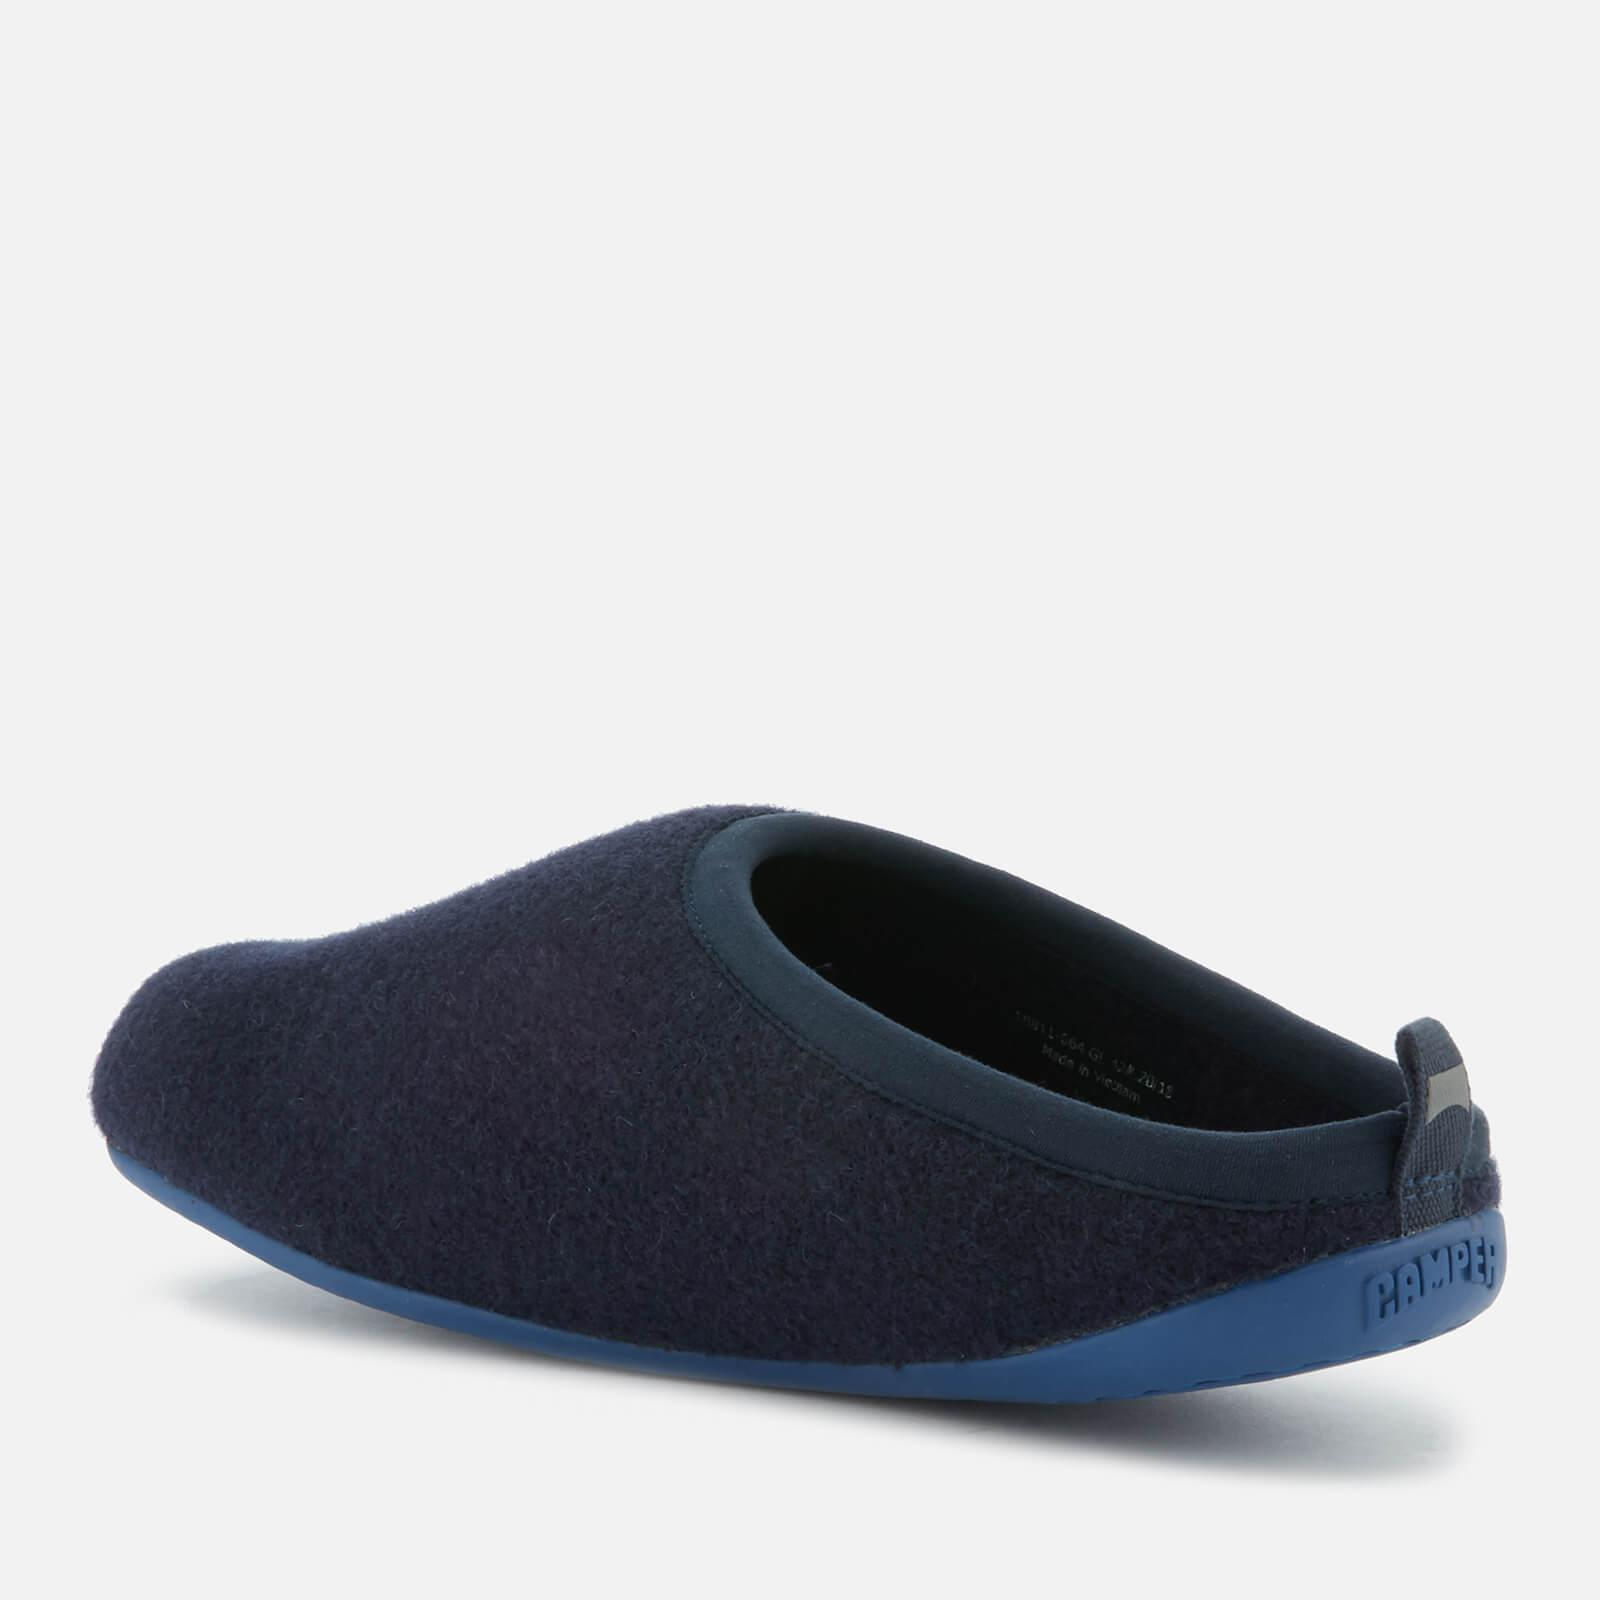 cb345b1daca Camper Wabi Wool Slippers in Blue for Men - Save 3.5087719298245617 ...